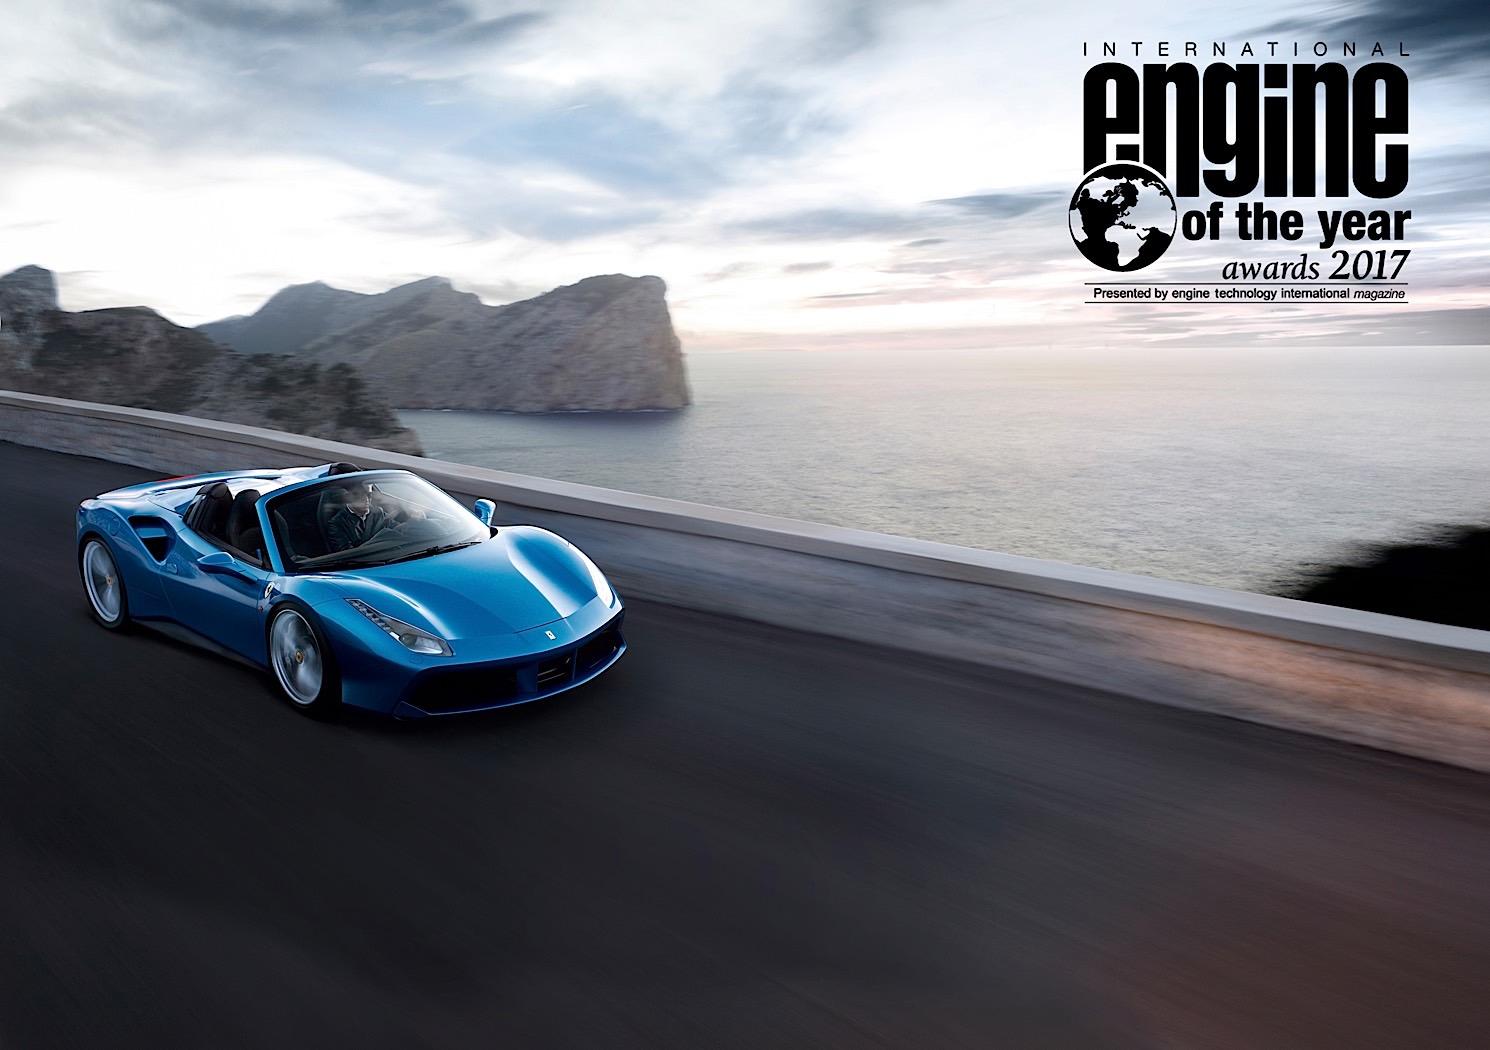 Ferrari bags 2017 International Engine of the Year award